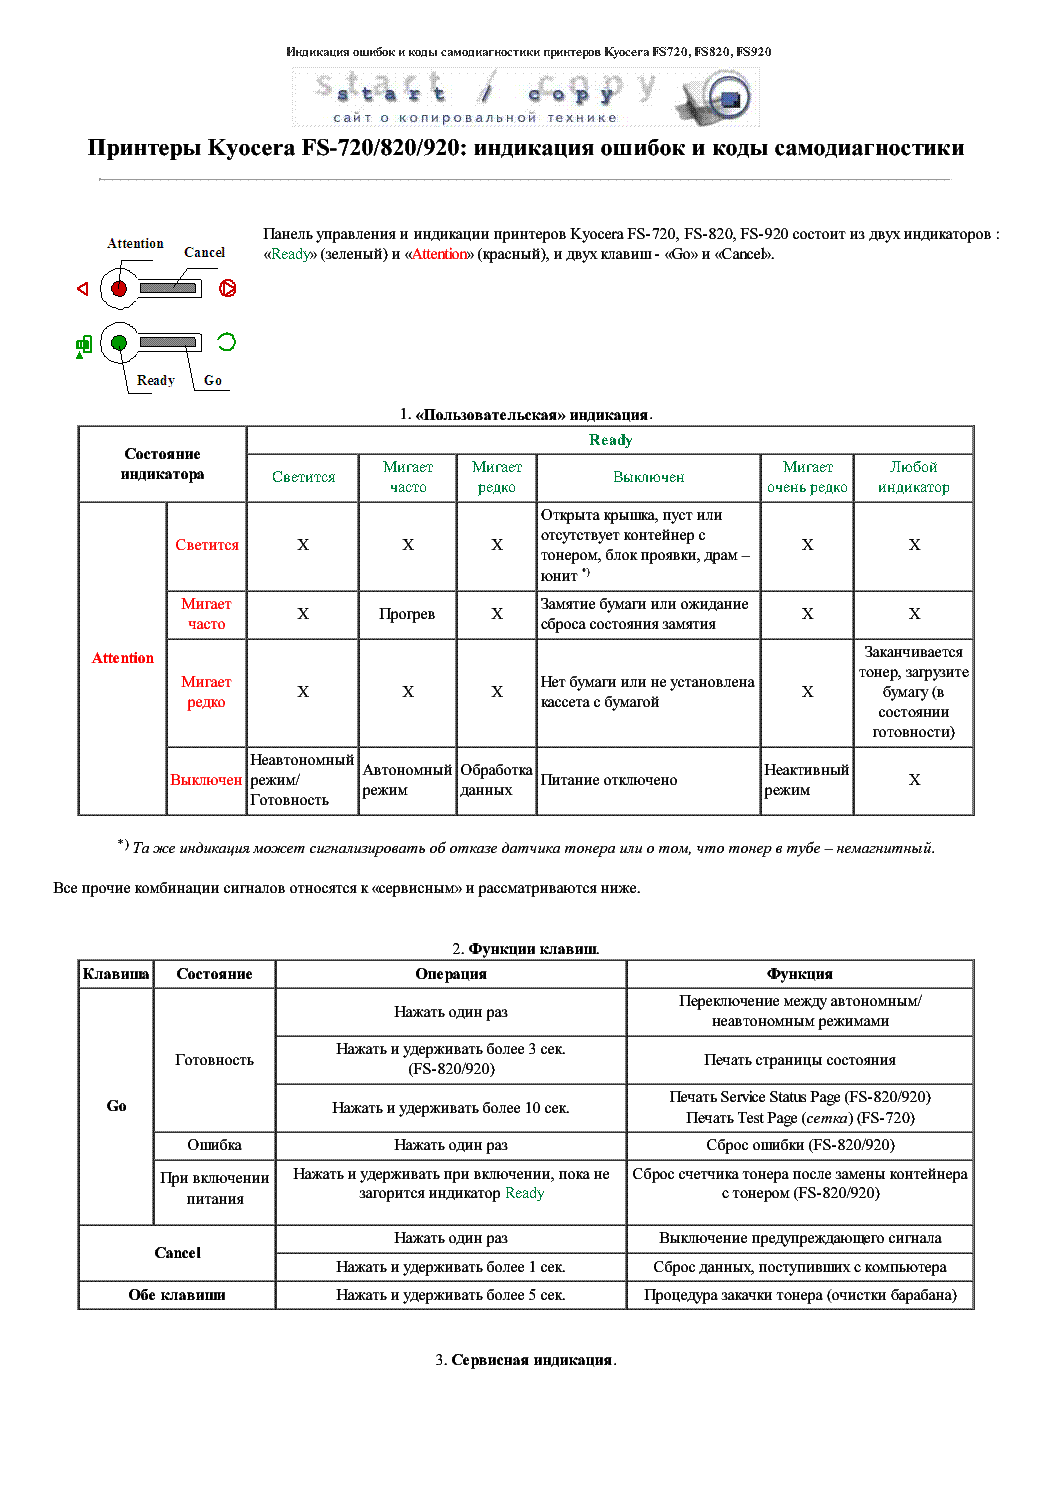 KYOCERA FS720 820 920 ERROR CODES Service Manual download